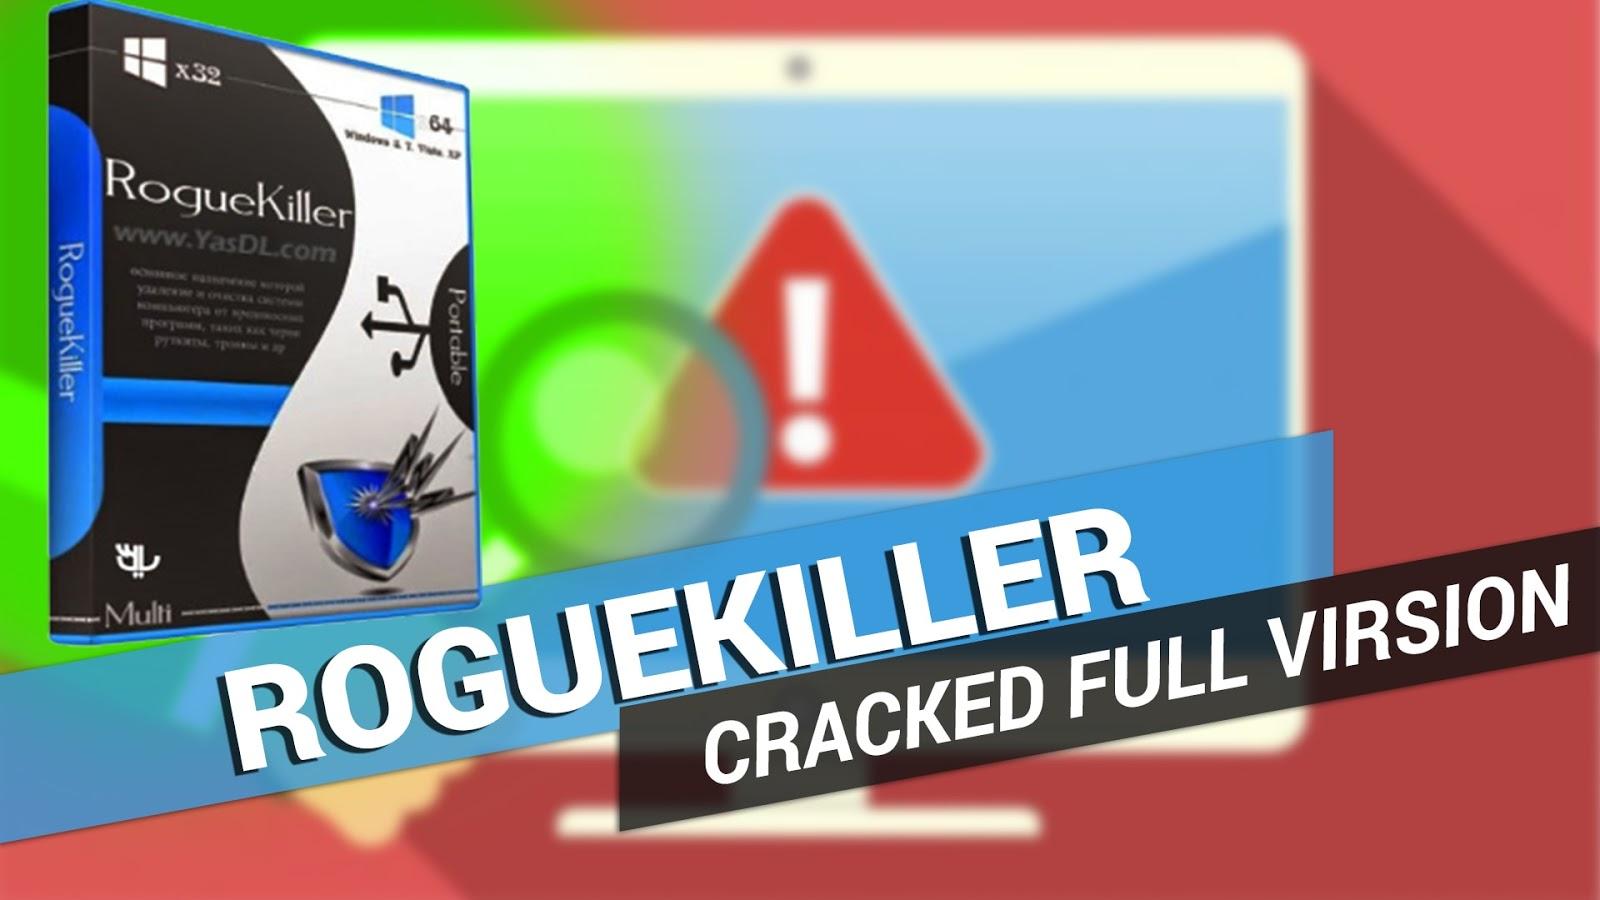 baixar roguekiller premium crackeado